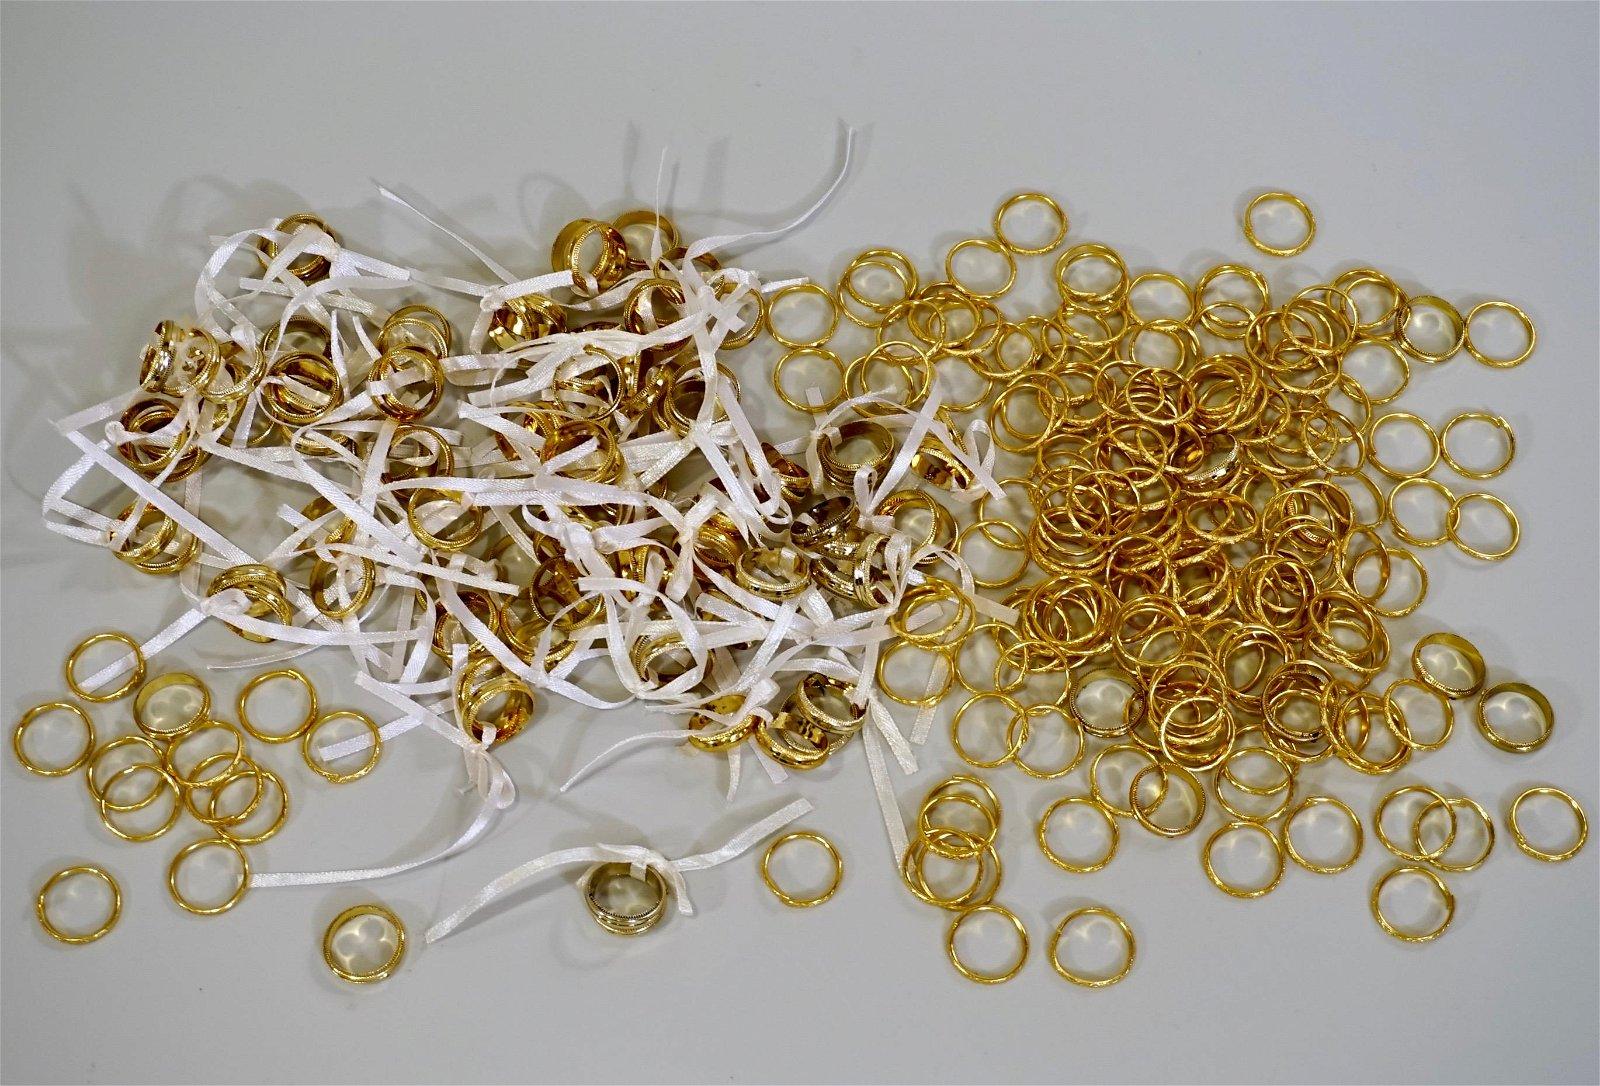 Gold Marriage Band Wedding Ring Decor Large Lot